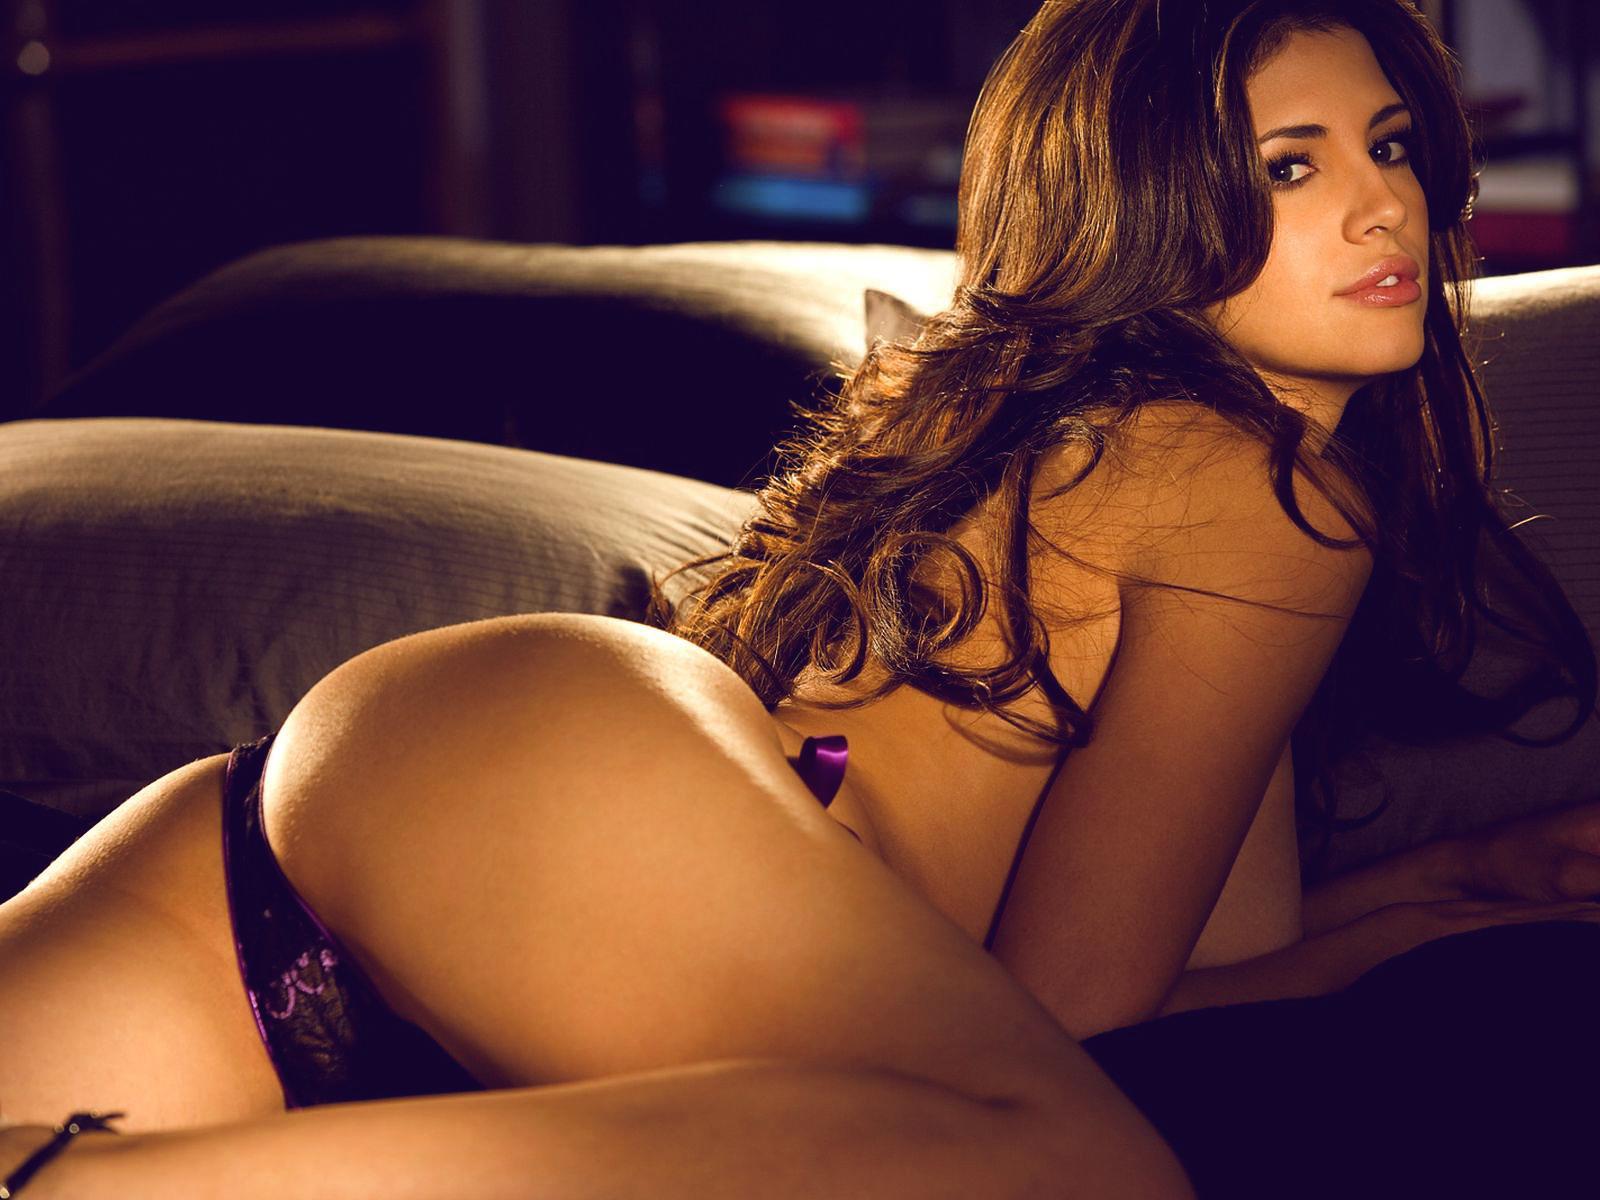 jamie lynn sigler porn photos